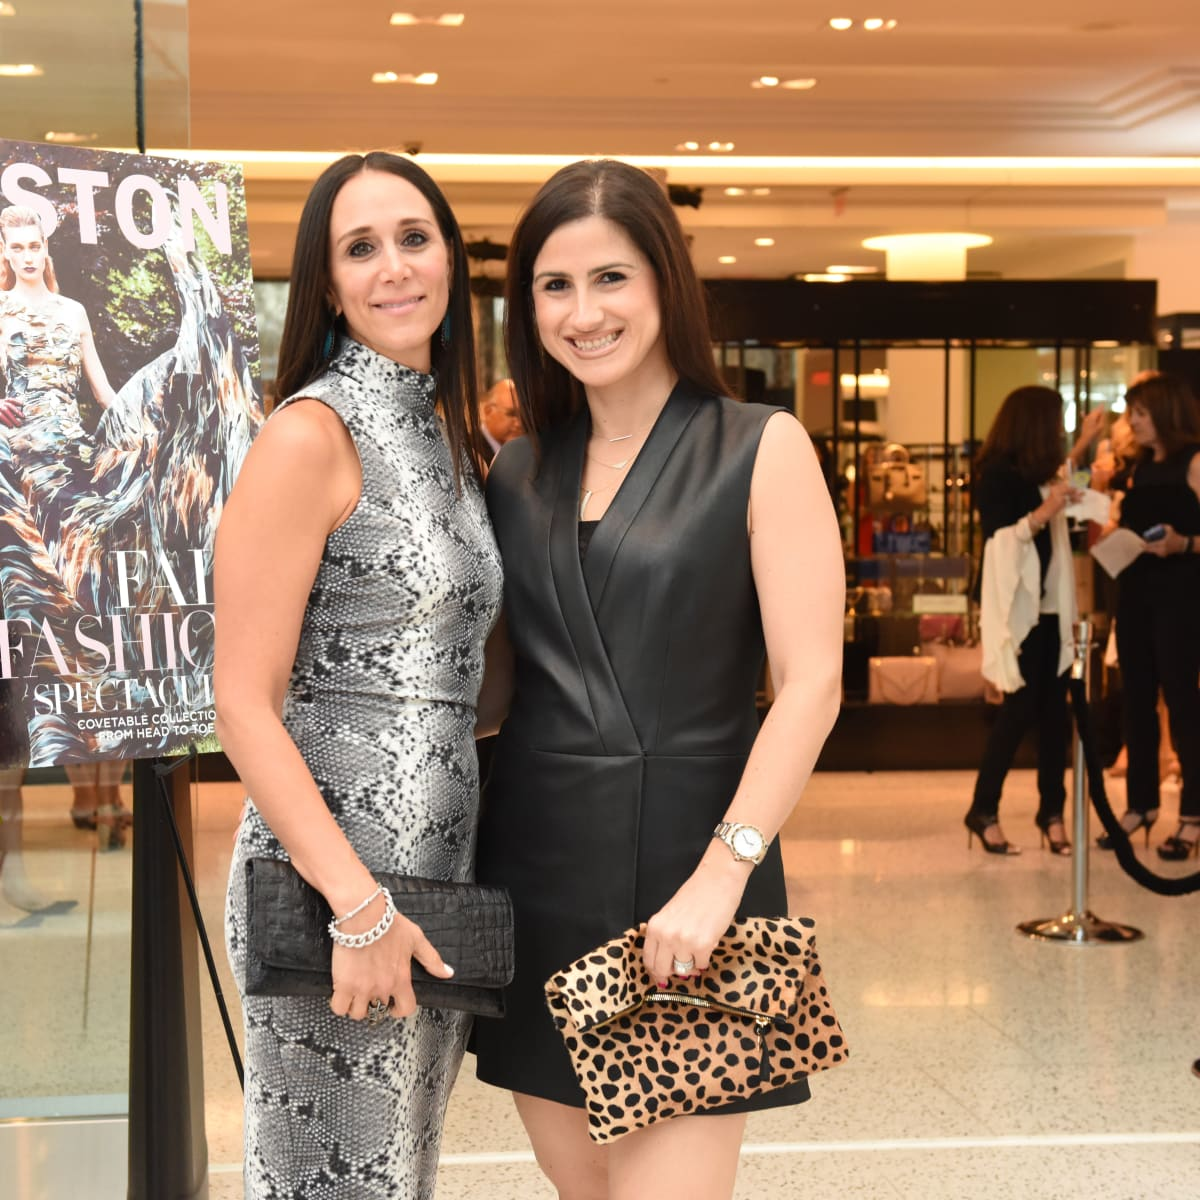 News, Shelby, Fresh Faces of Fashion, Sept. 2015, Amy Zadok, Lisa Zadok